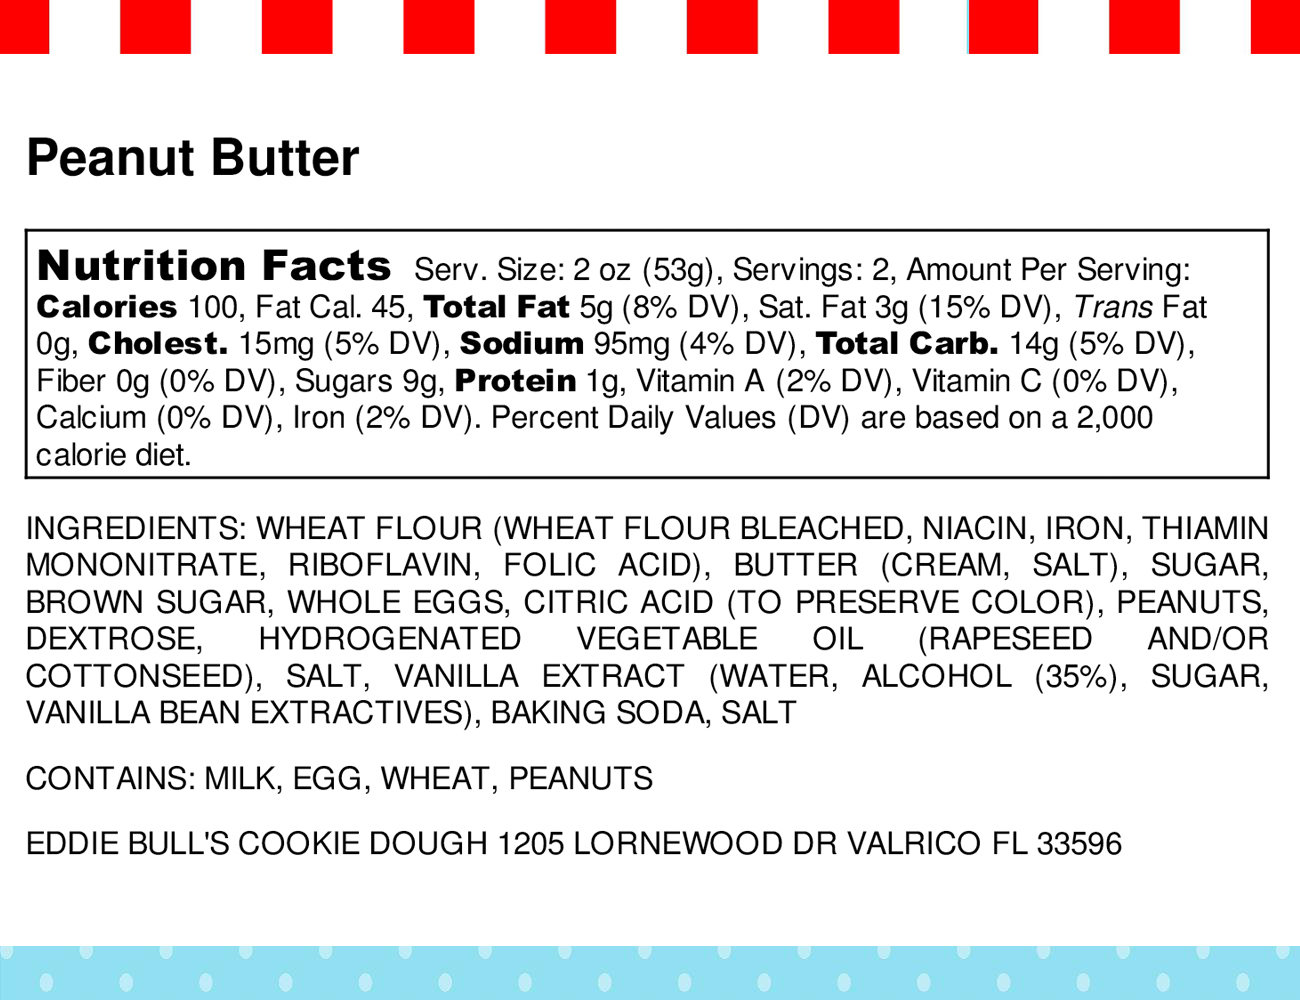 peanut butter nutritional info